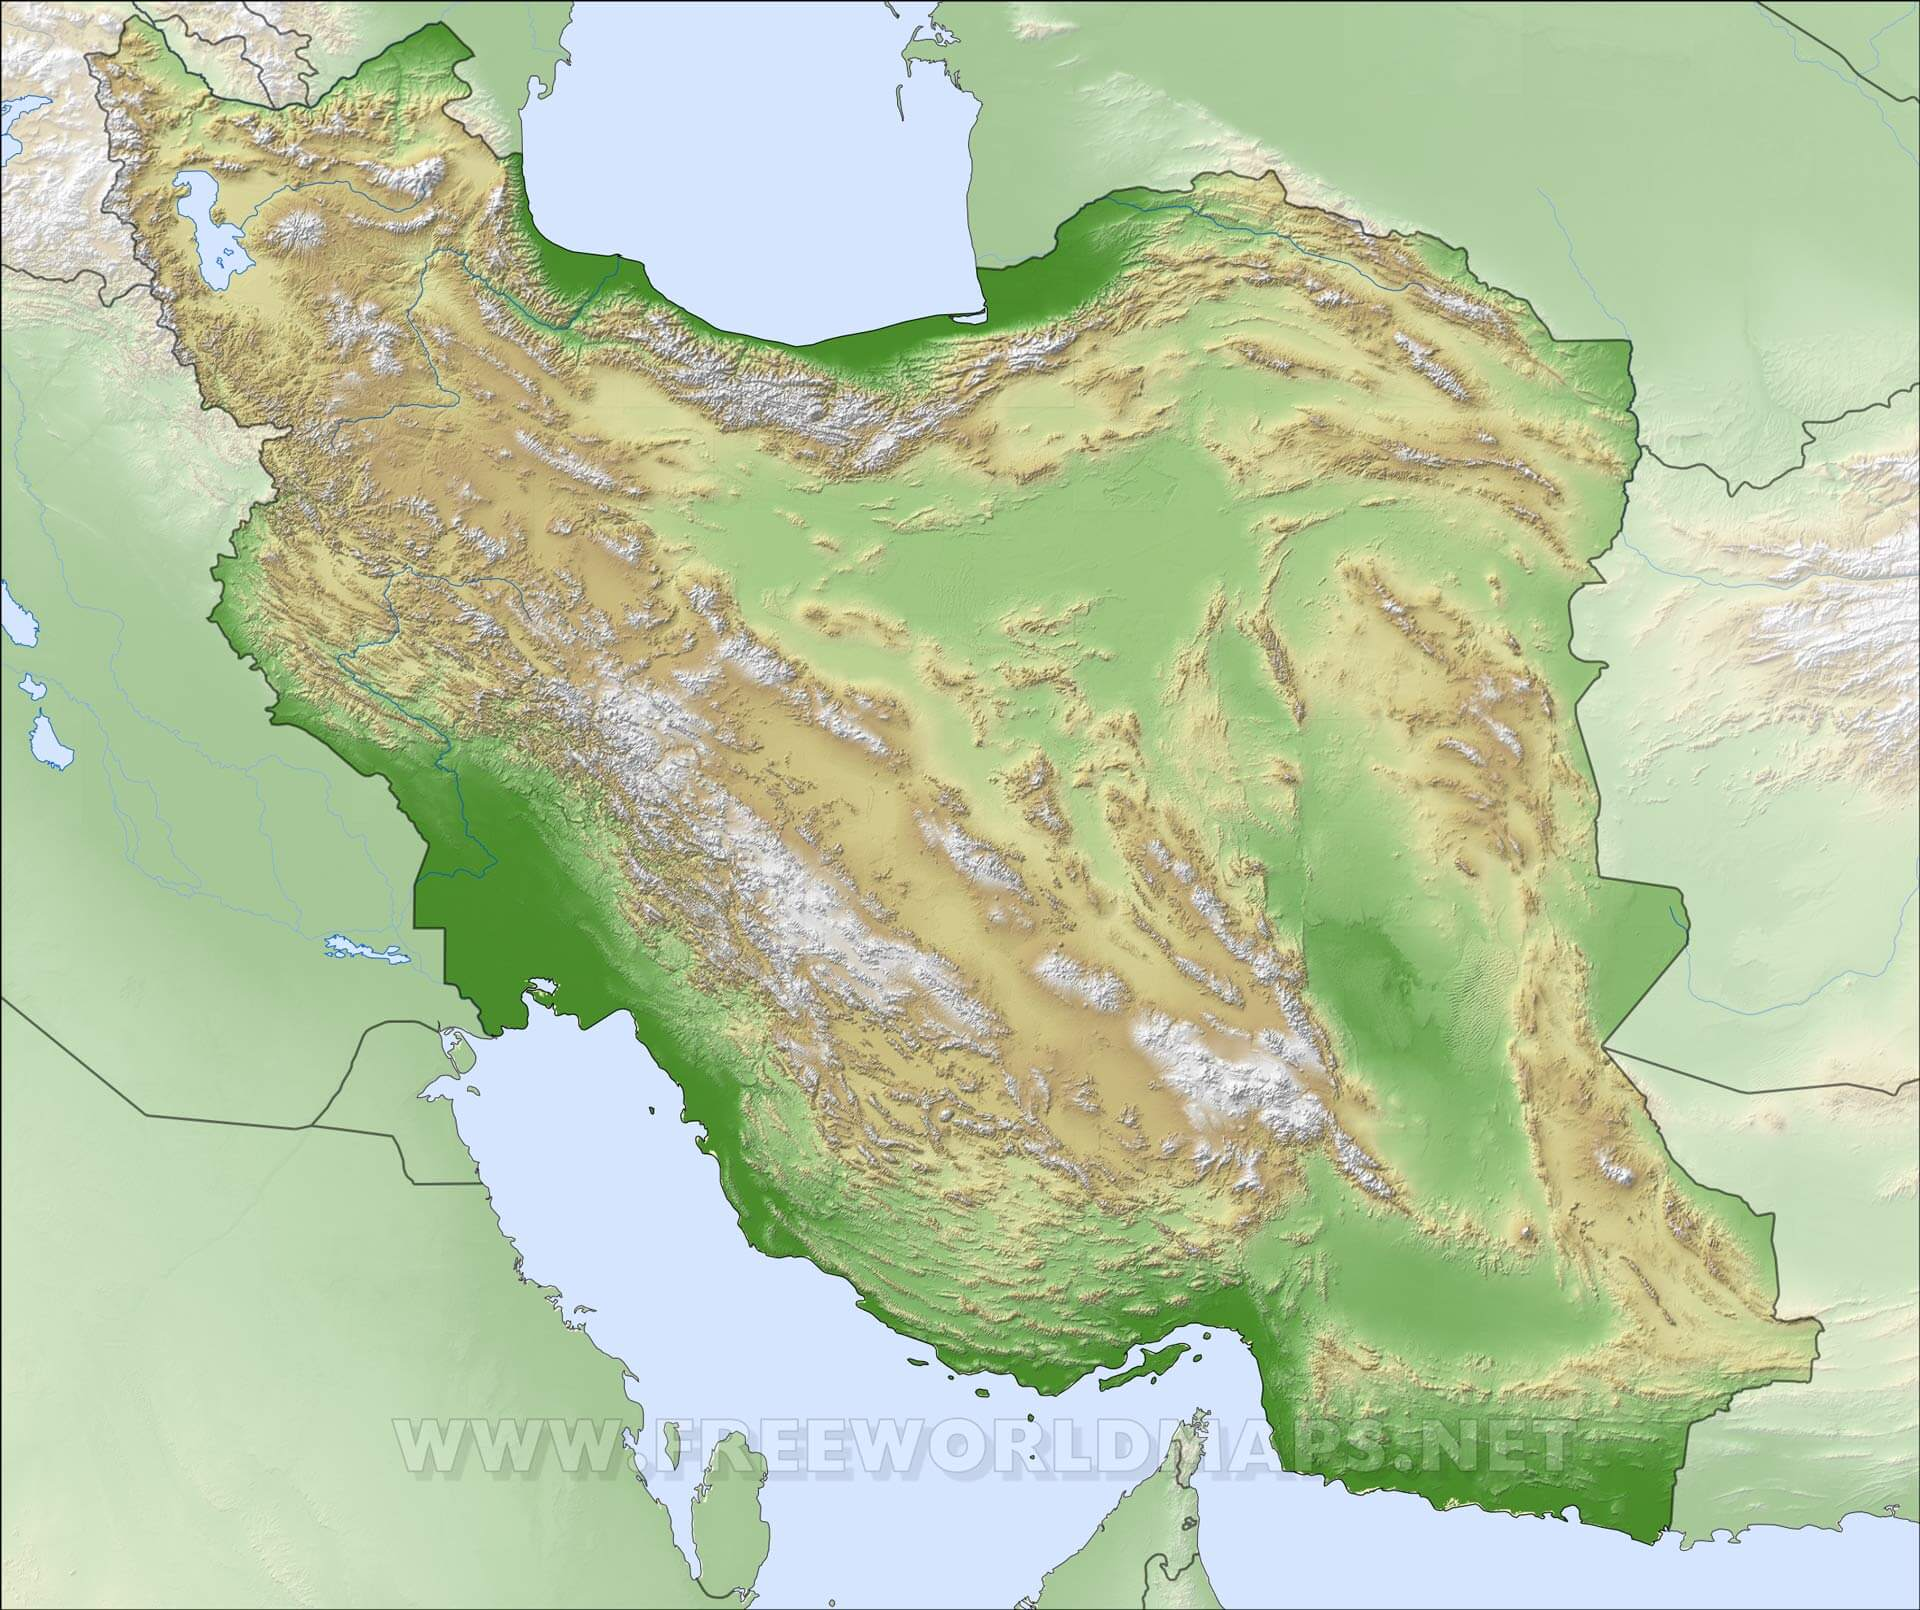 Iran Physical Map on brazil map, saudi arabia, qatar map, france map, ali khamenei, mahmoud ahmadinejad, china map, turkey map, israel map, japan map, georgia map, europe map, nigeria map, persian gulf, saudi arabia map, russia map, greece map, persia map, iraq map, spain map, germany map, mexico map, persian language, persian map, united states map, persian people,